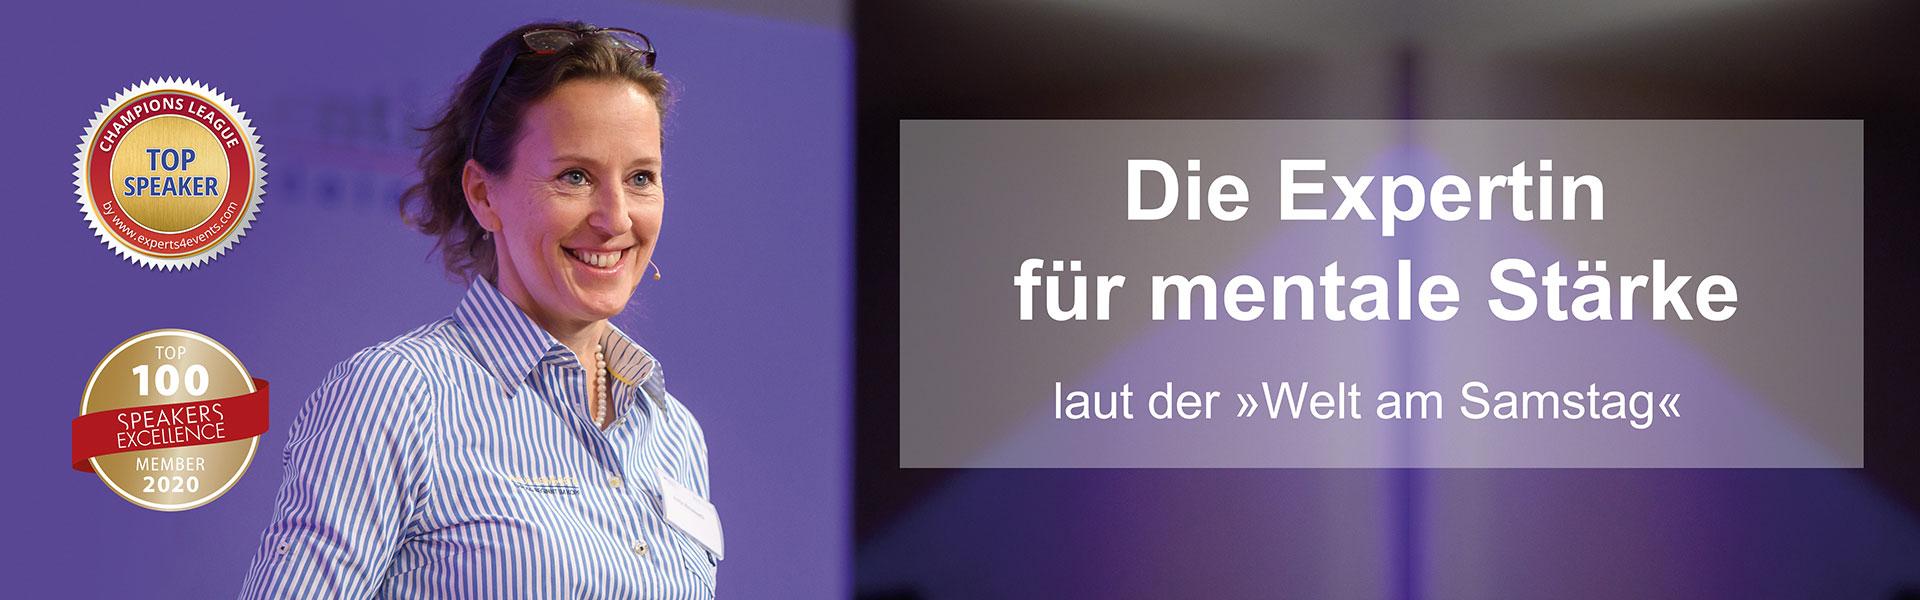 Selbstführung Live Online Webinar - Antje Heimsoeth